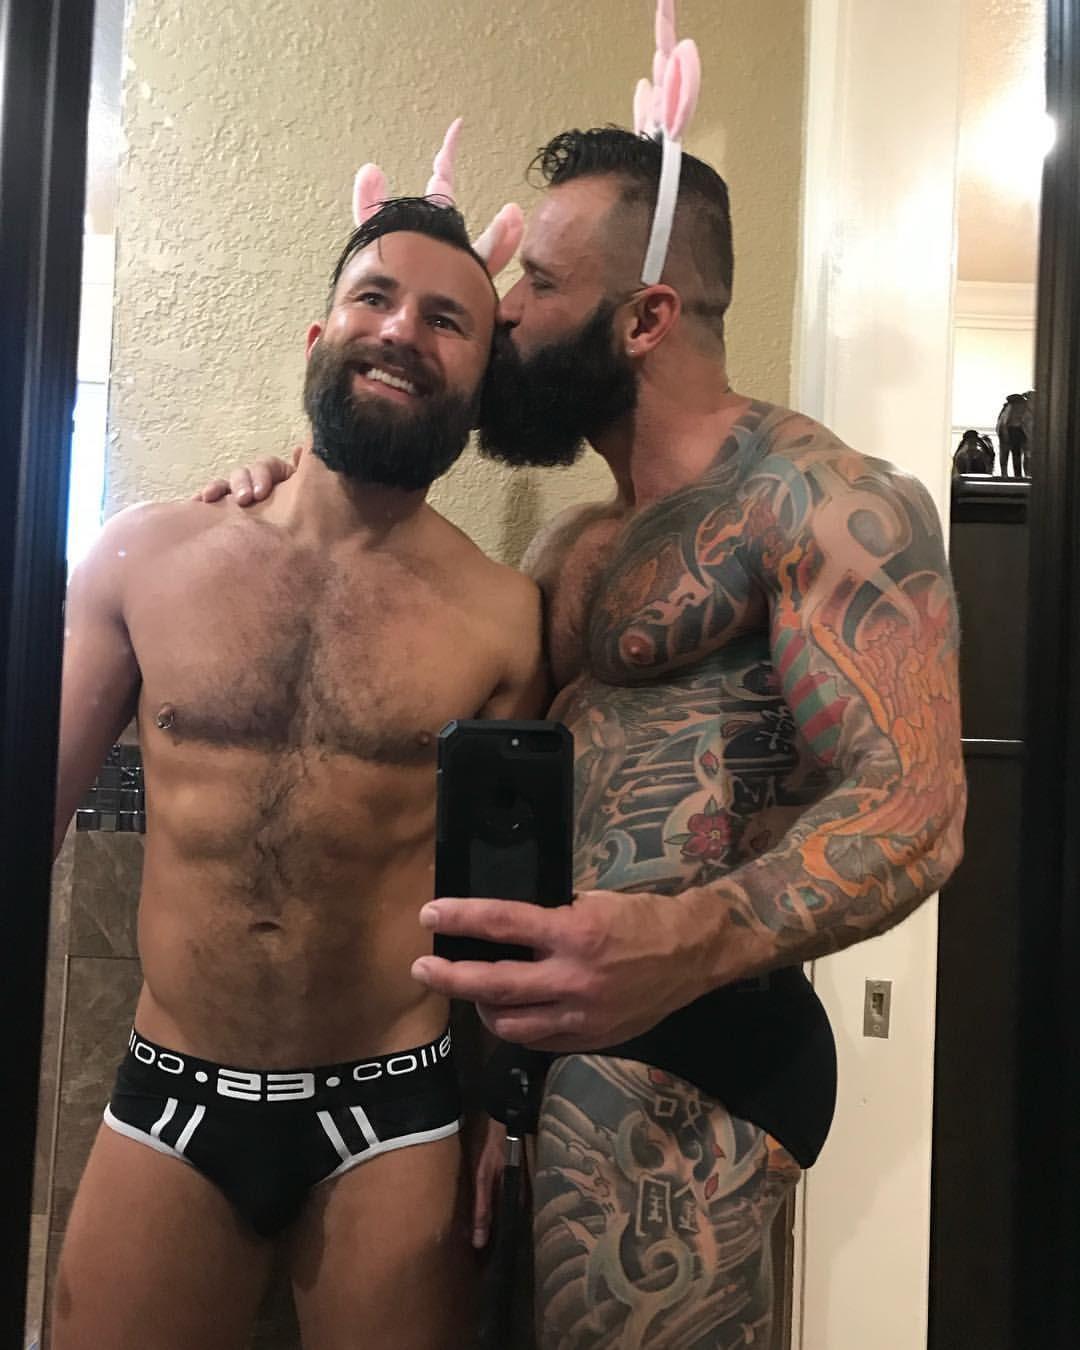 Bushy men likes each other